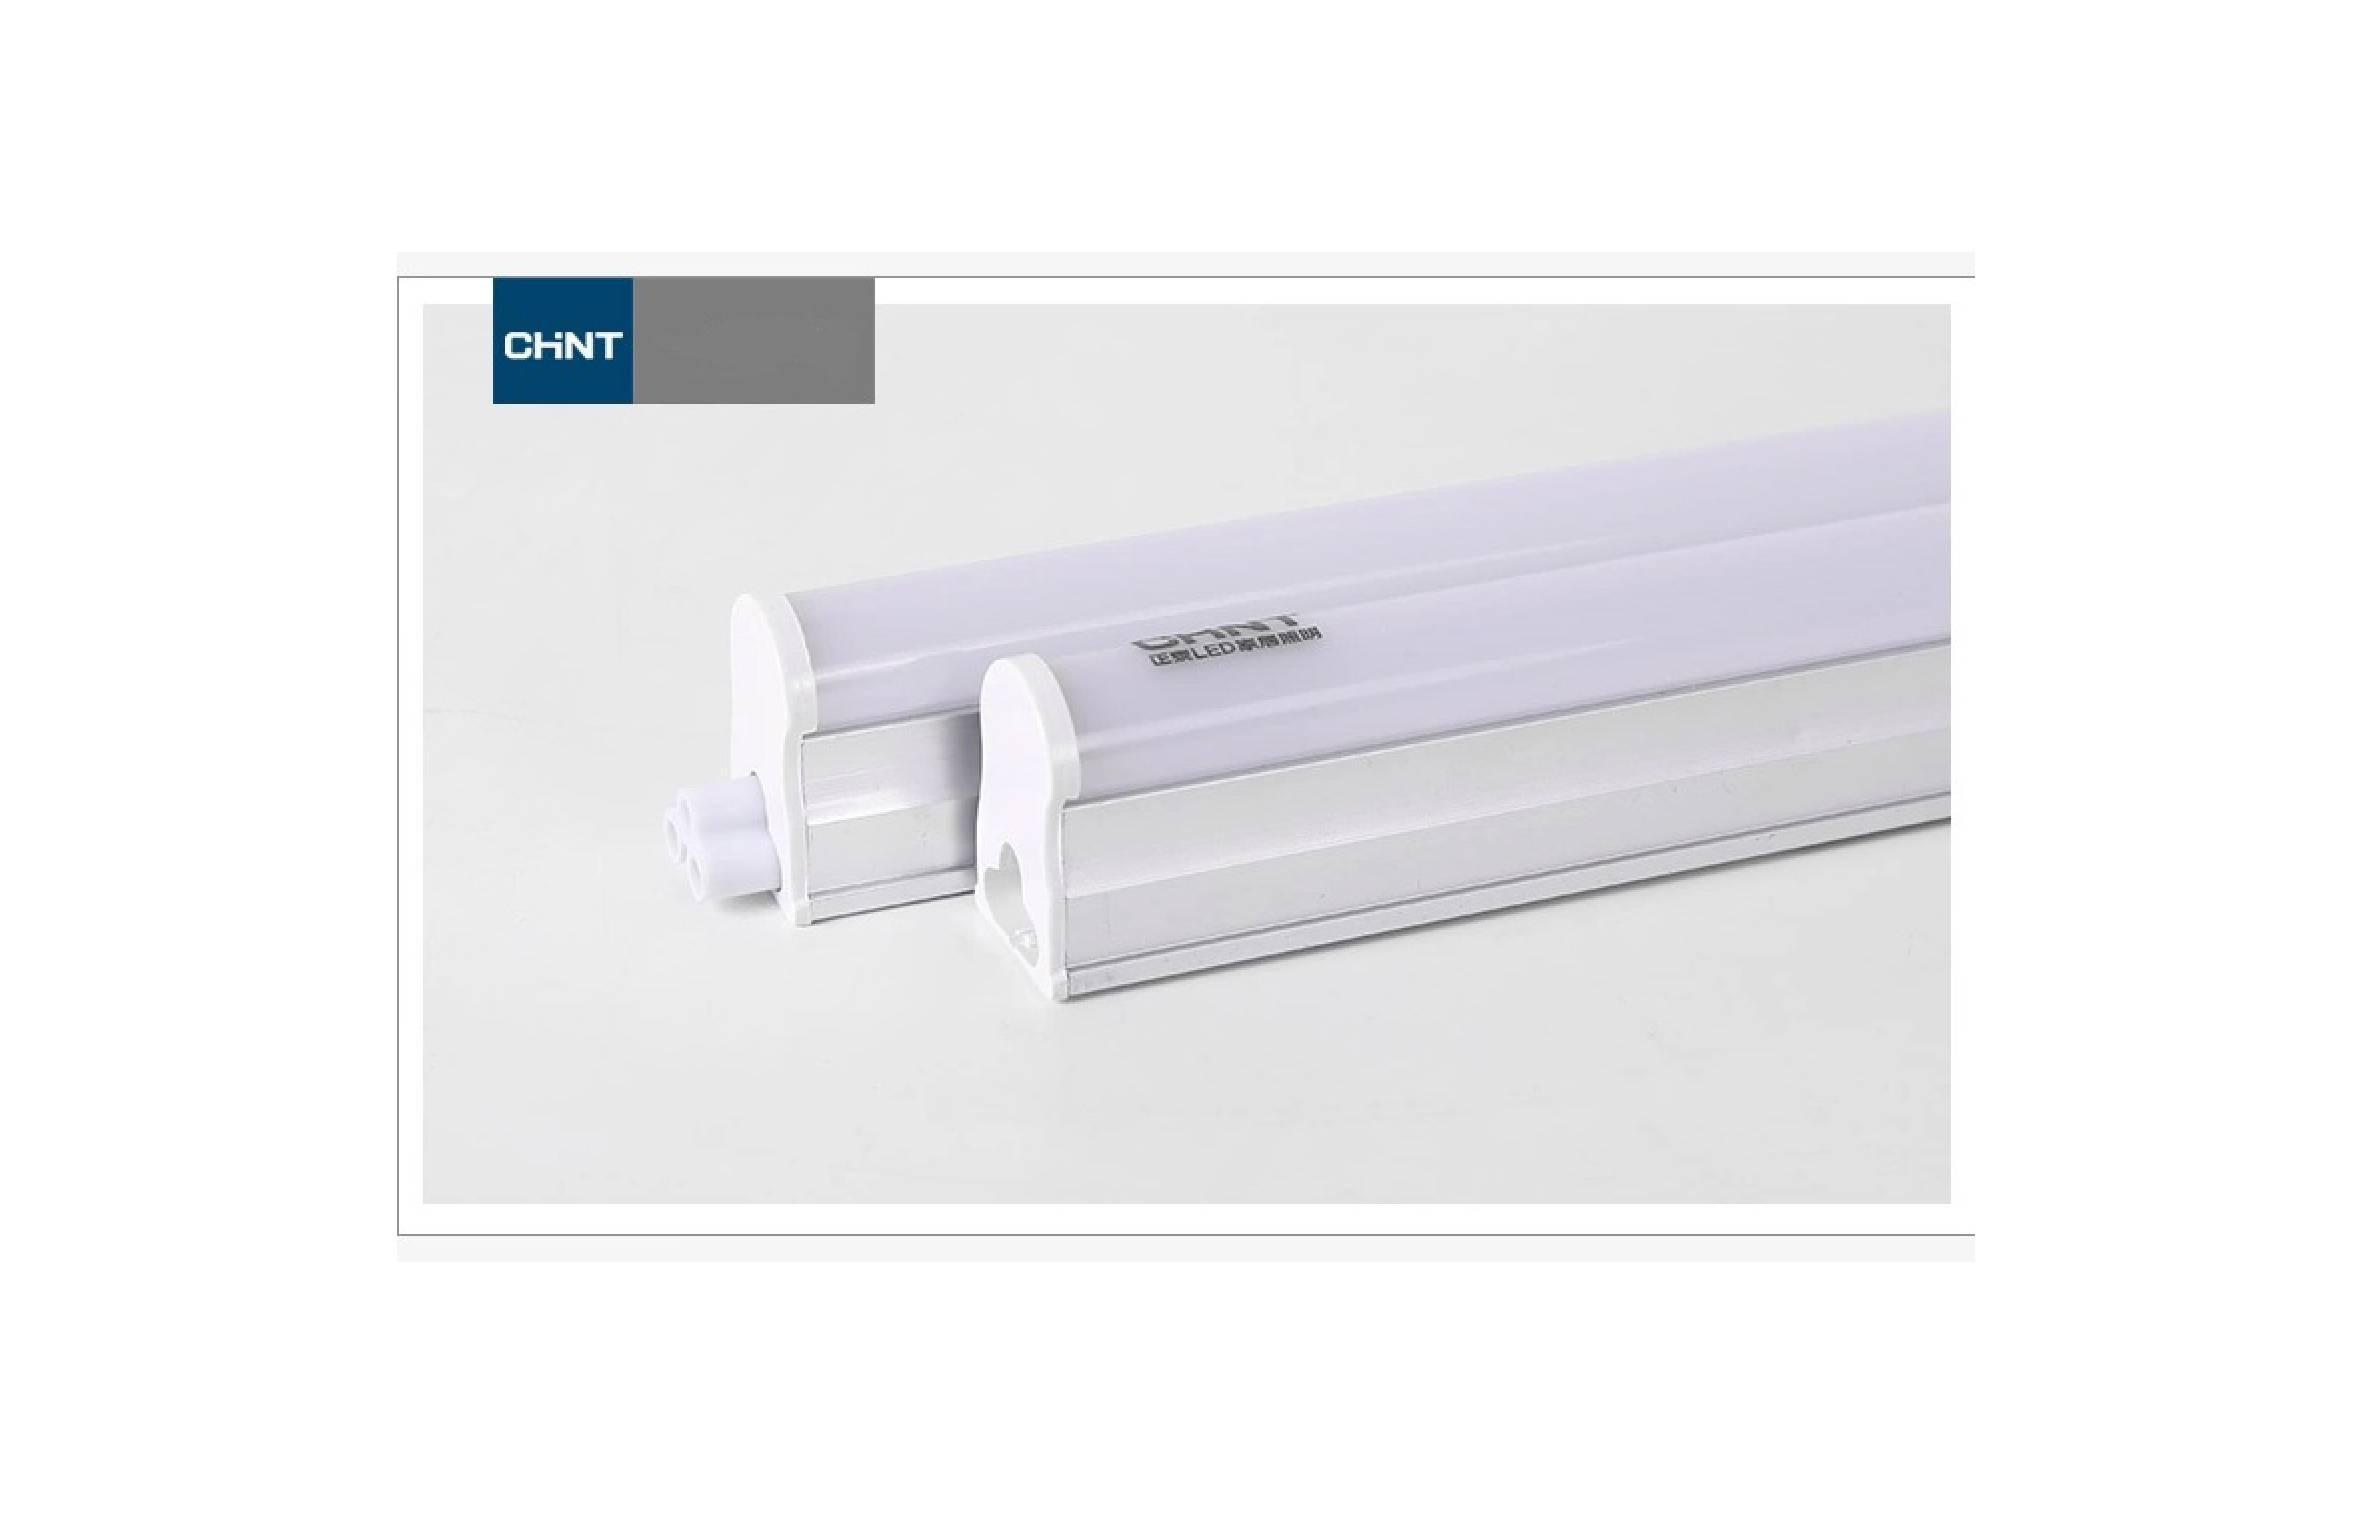 Lampu LED Chint 11 watt Kuning 3000K T5 Batten 11watt Philips GARANSI